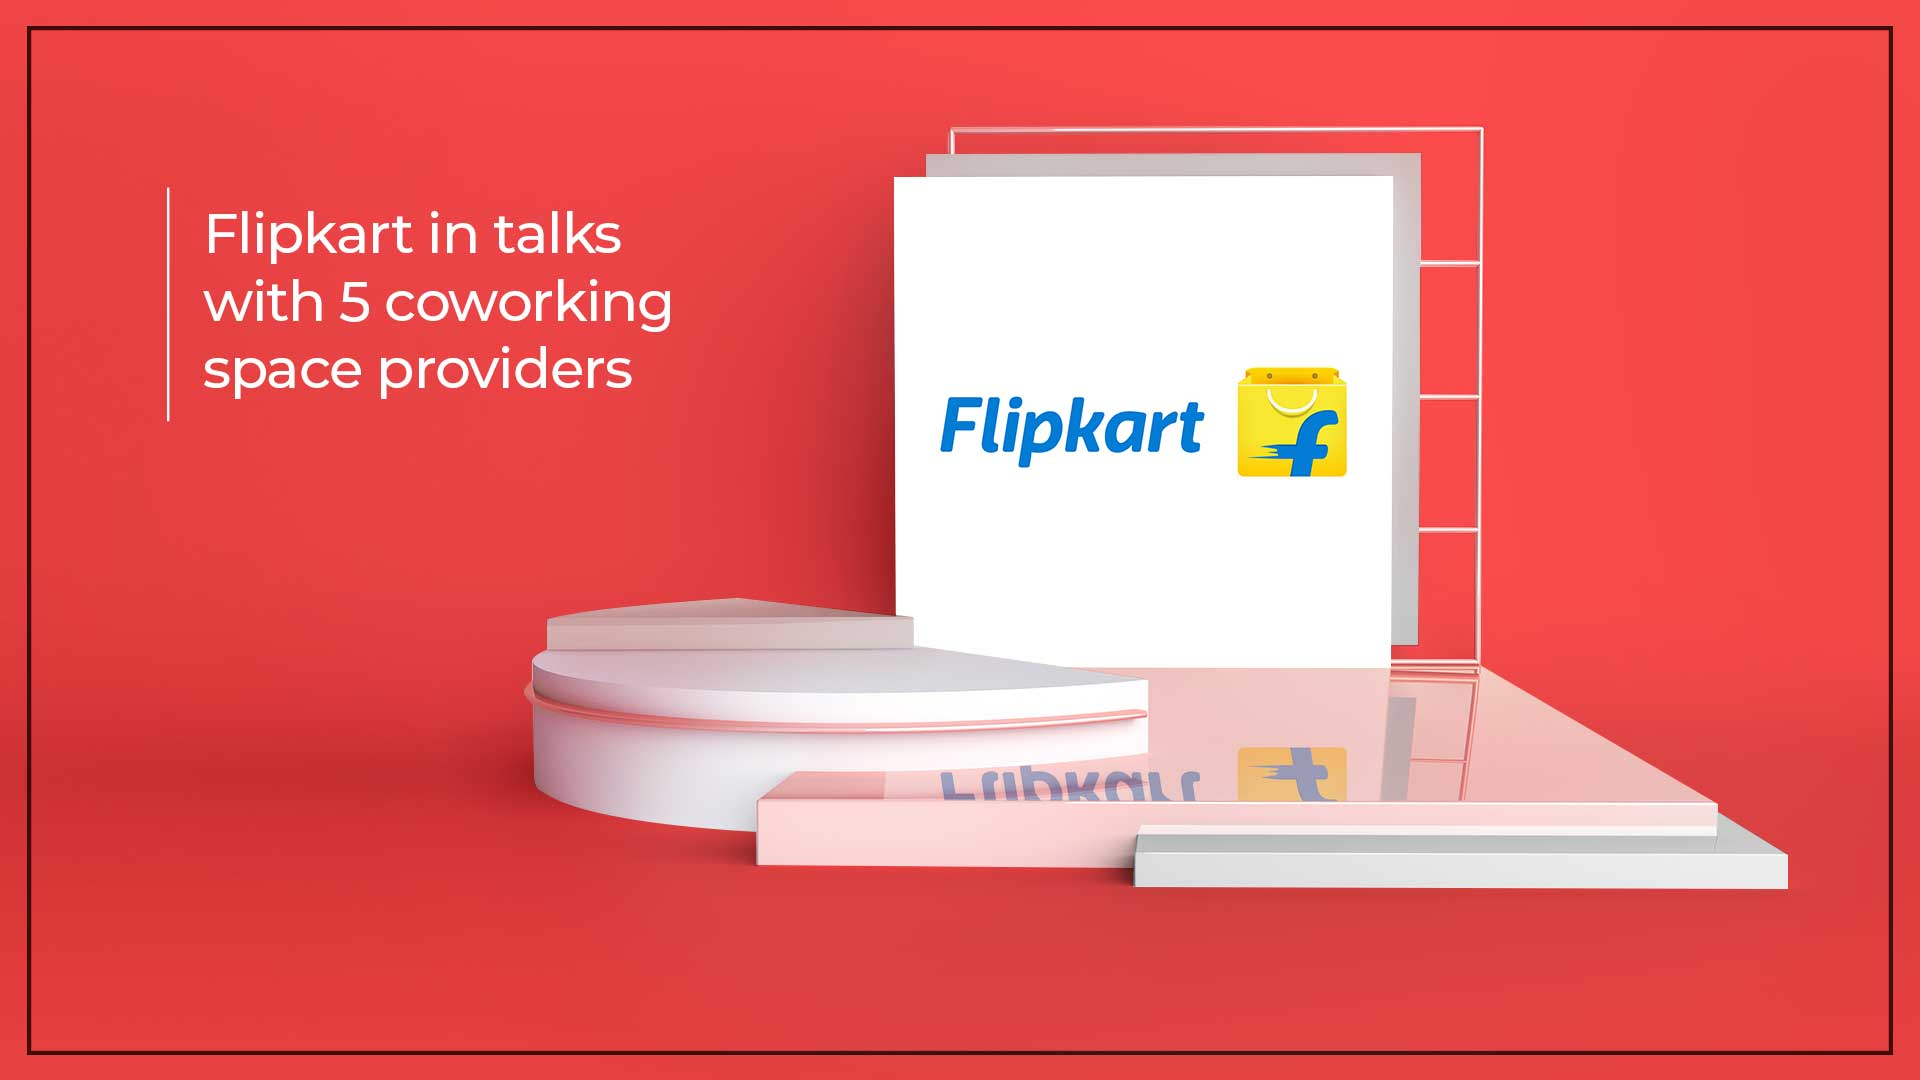 Flipkart Aims To Lease 3,000 Coworking Desks In Bengaluru